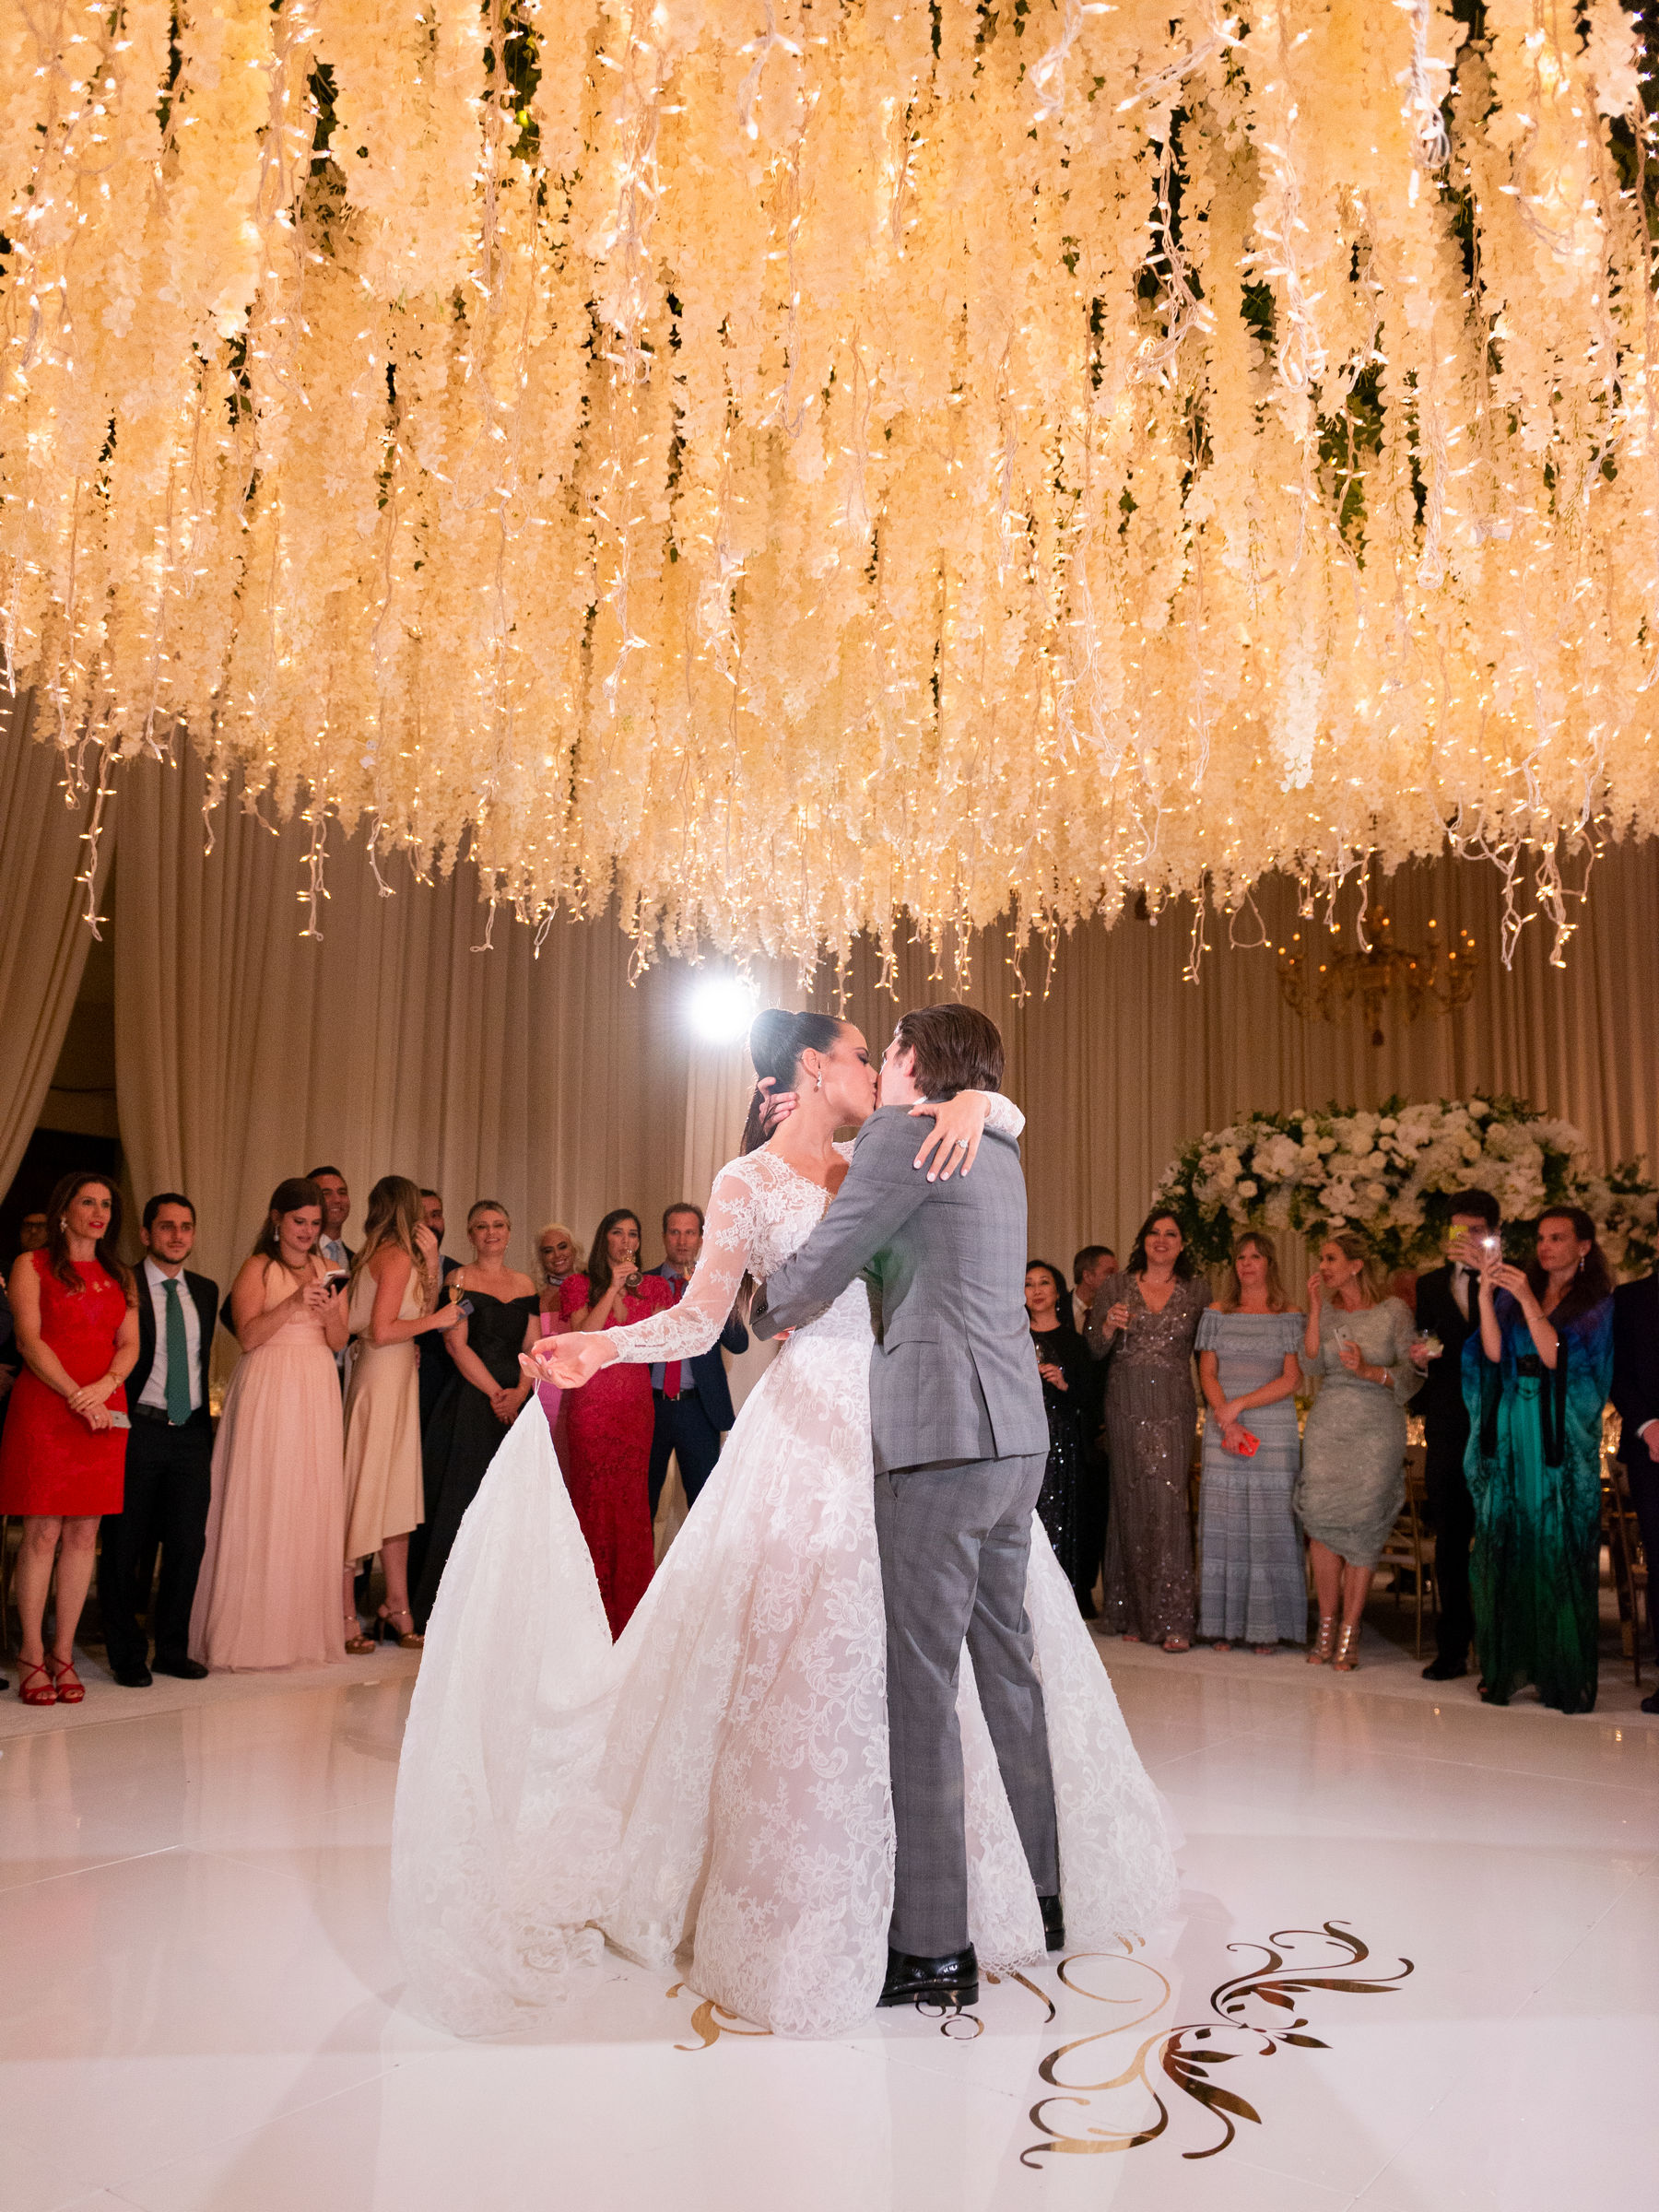 maria-eduardo-montage-beverly-hills-wedding-209.jpg